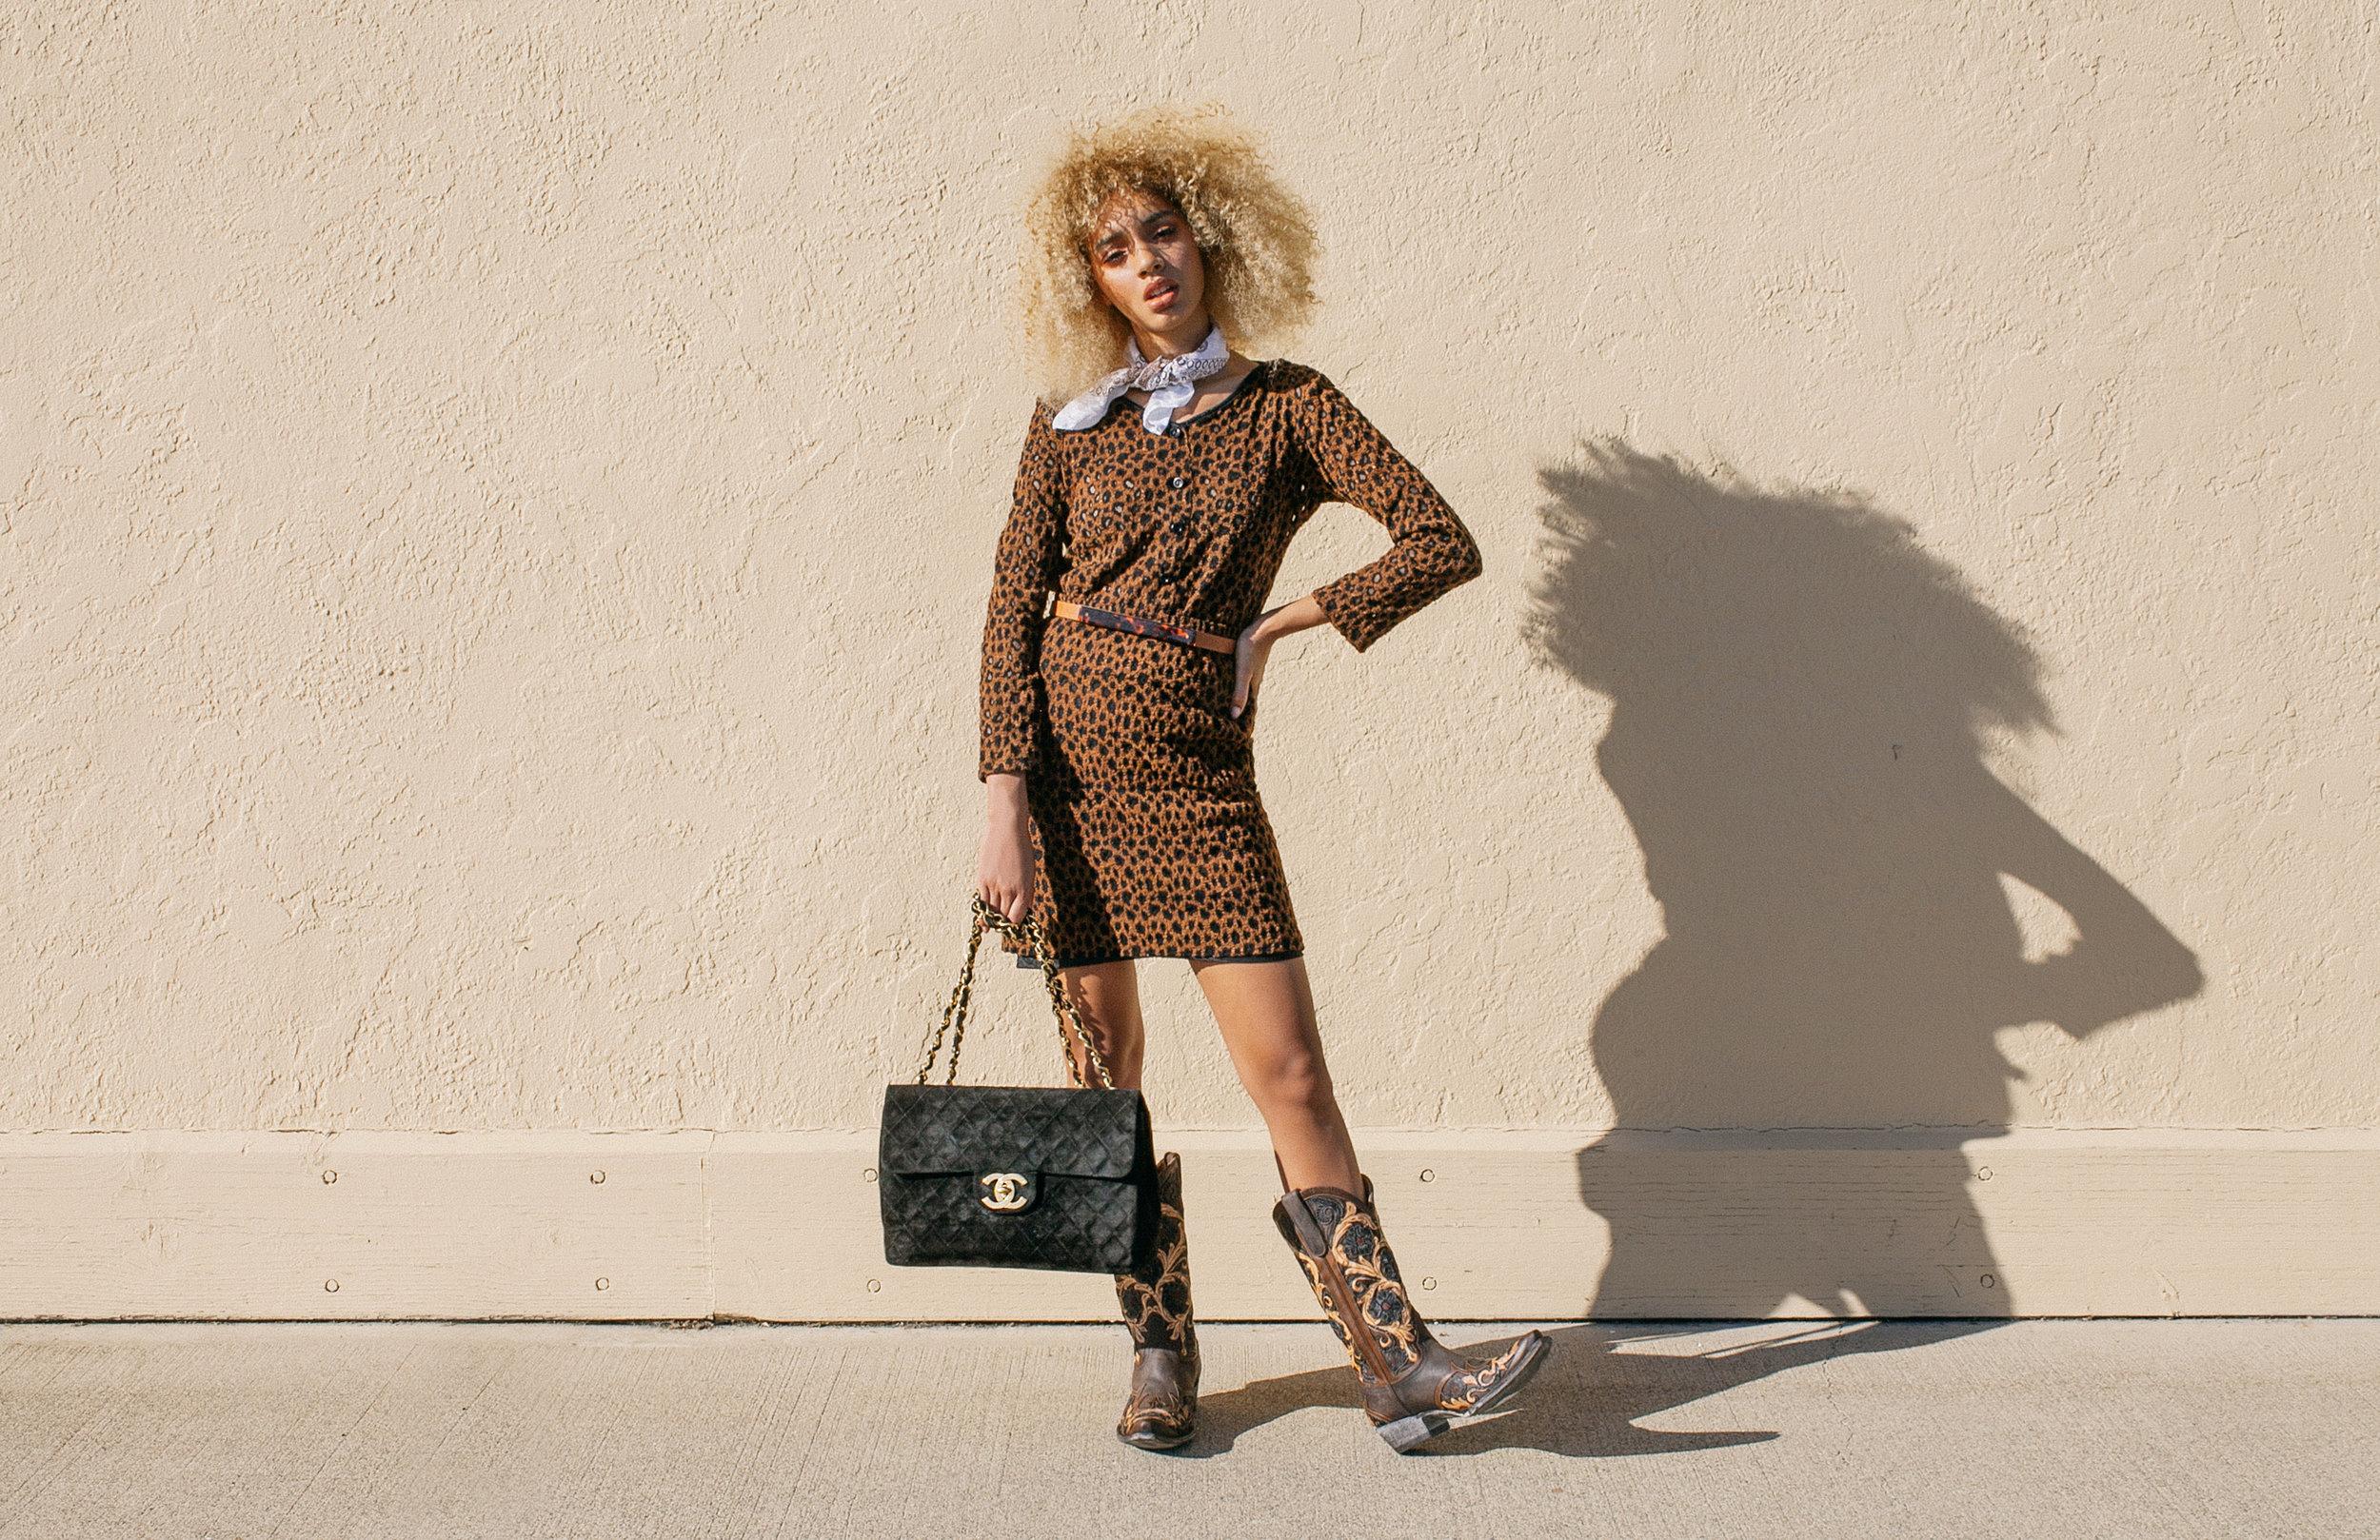 Published in Volume 4 : Number 73 | August 2018   BRIANNA   Photographer: Jessica Portillo; Model: Brianna Lopez | DT Model Management; Makeup Artist: Erin Nakashima; Hair Stylist: Monica Preciado; Wardrobe Stylist: Vivian Kania